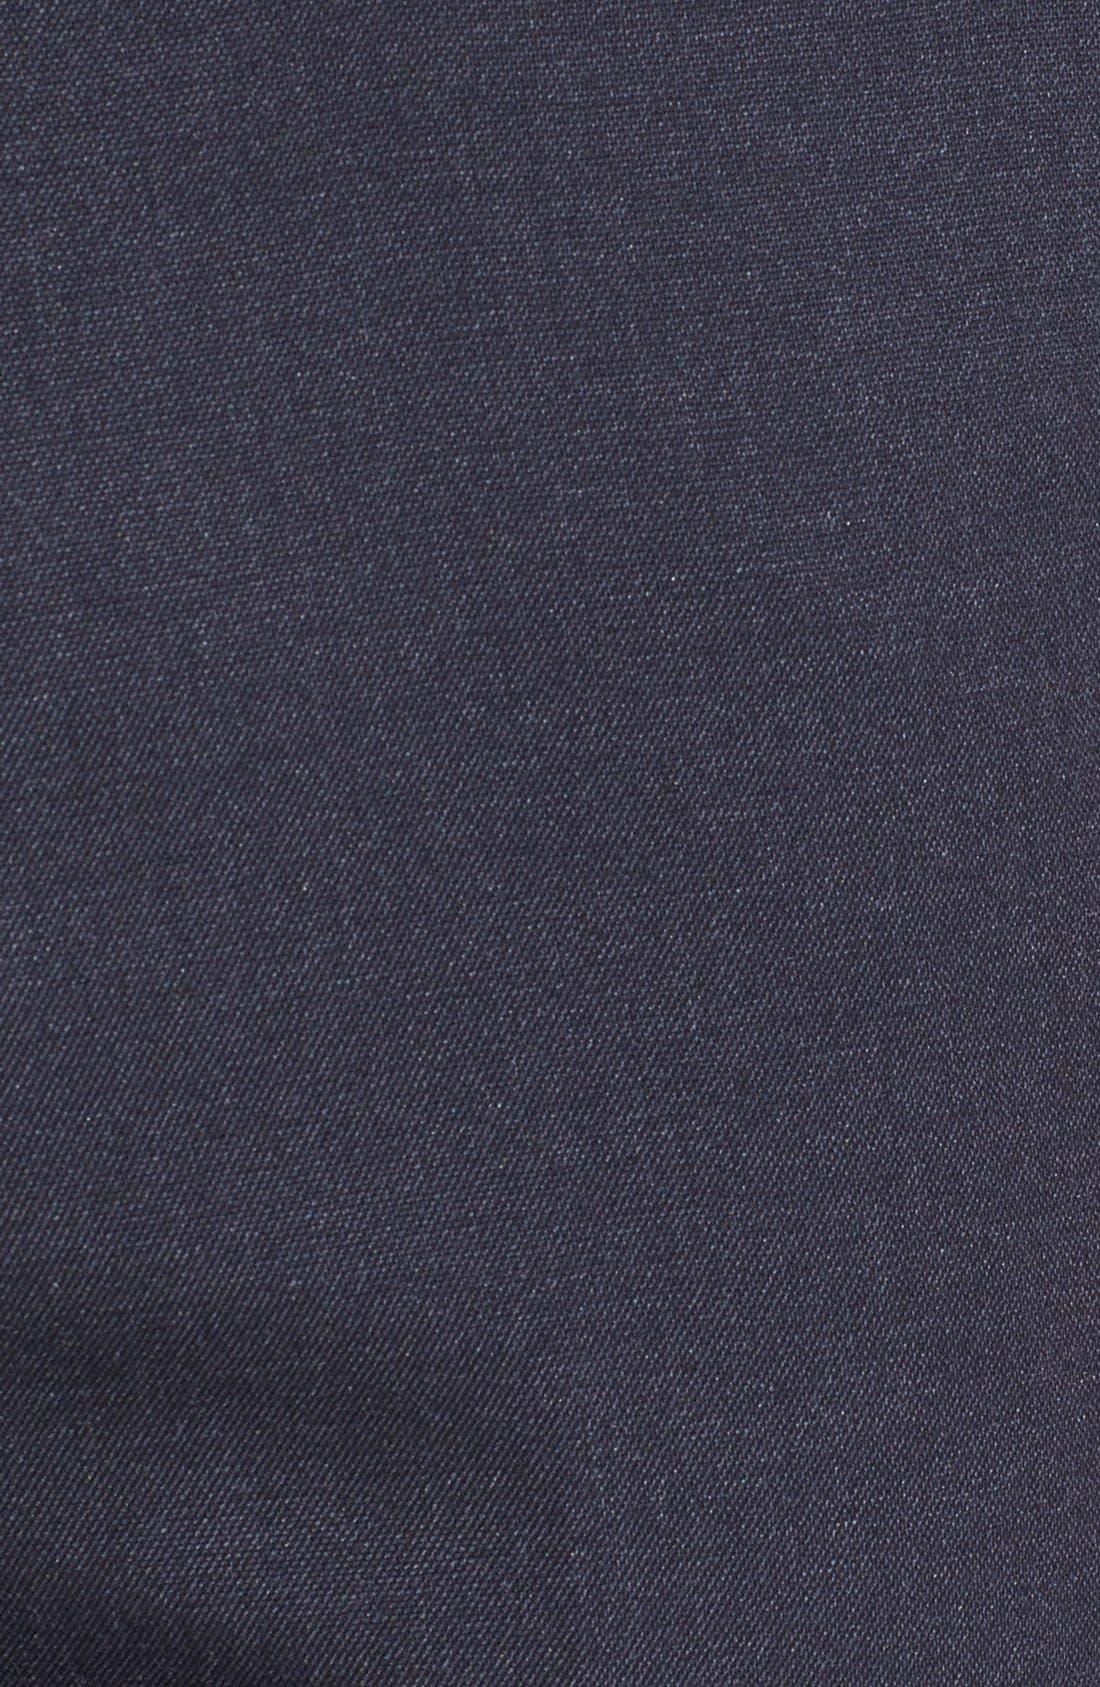 Alternate Image 3  - Ted Baker London 'Shabtro' Multi Fabric Trousers